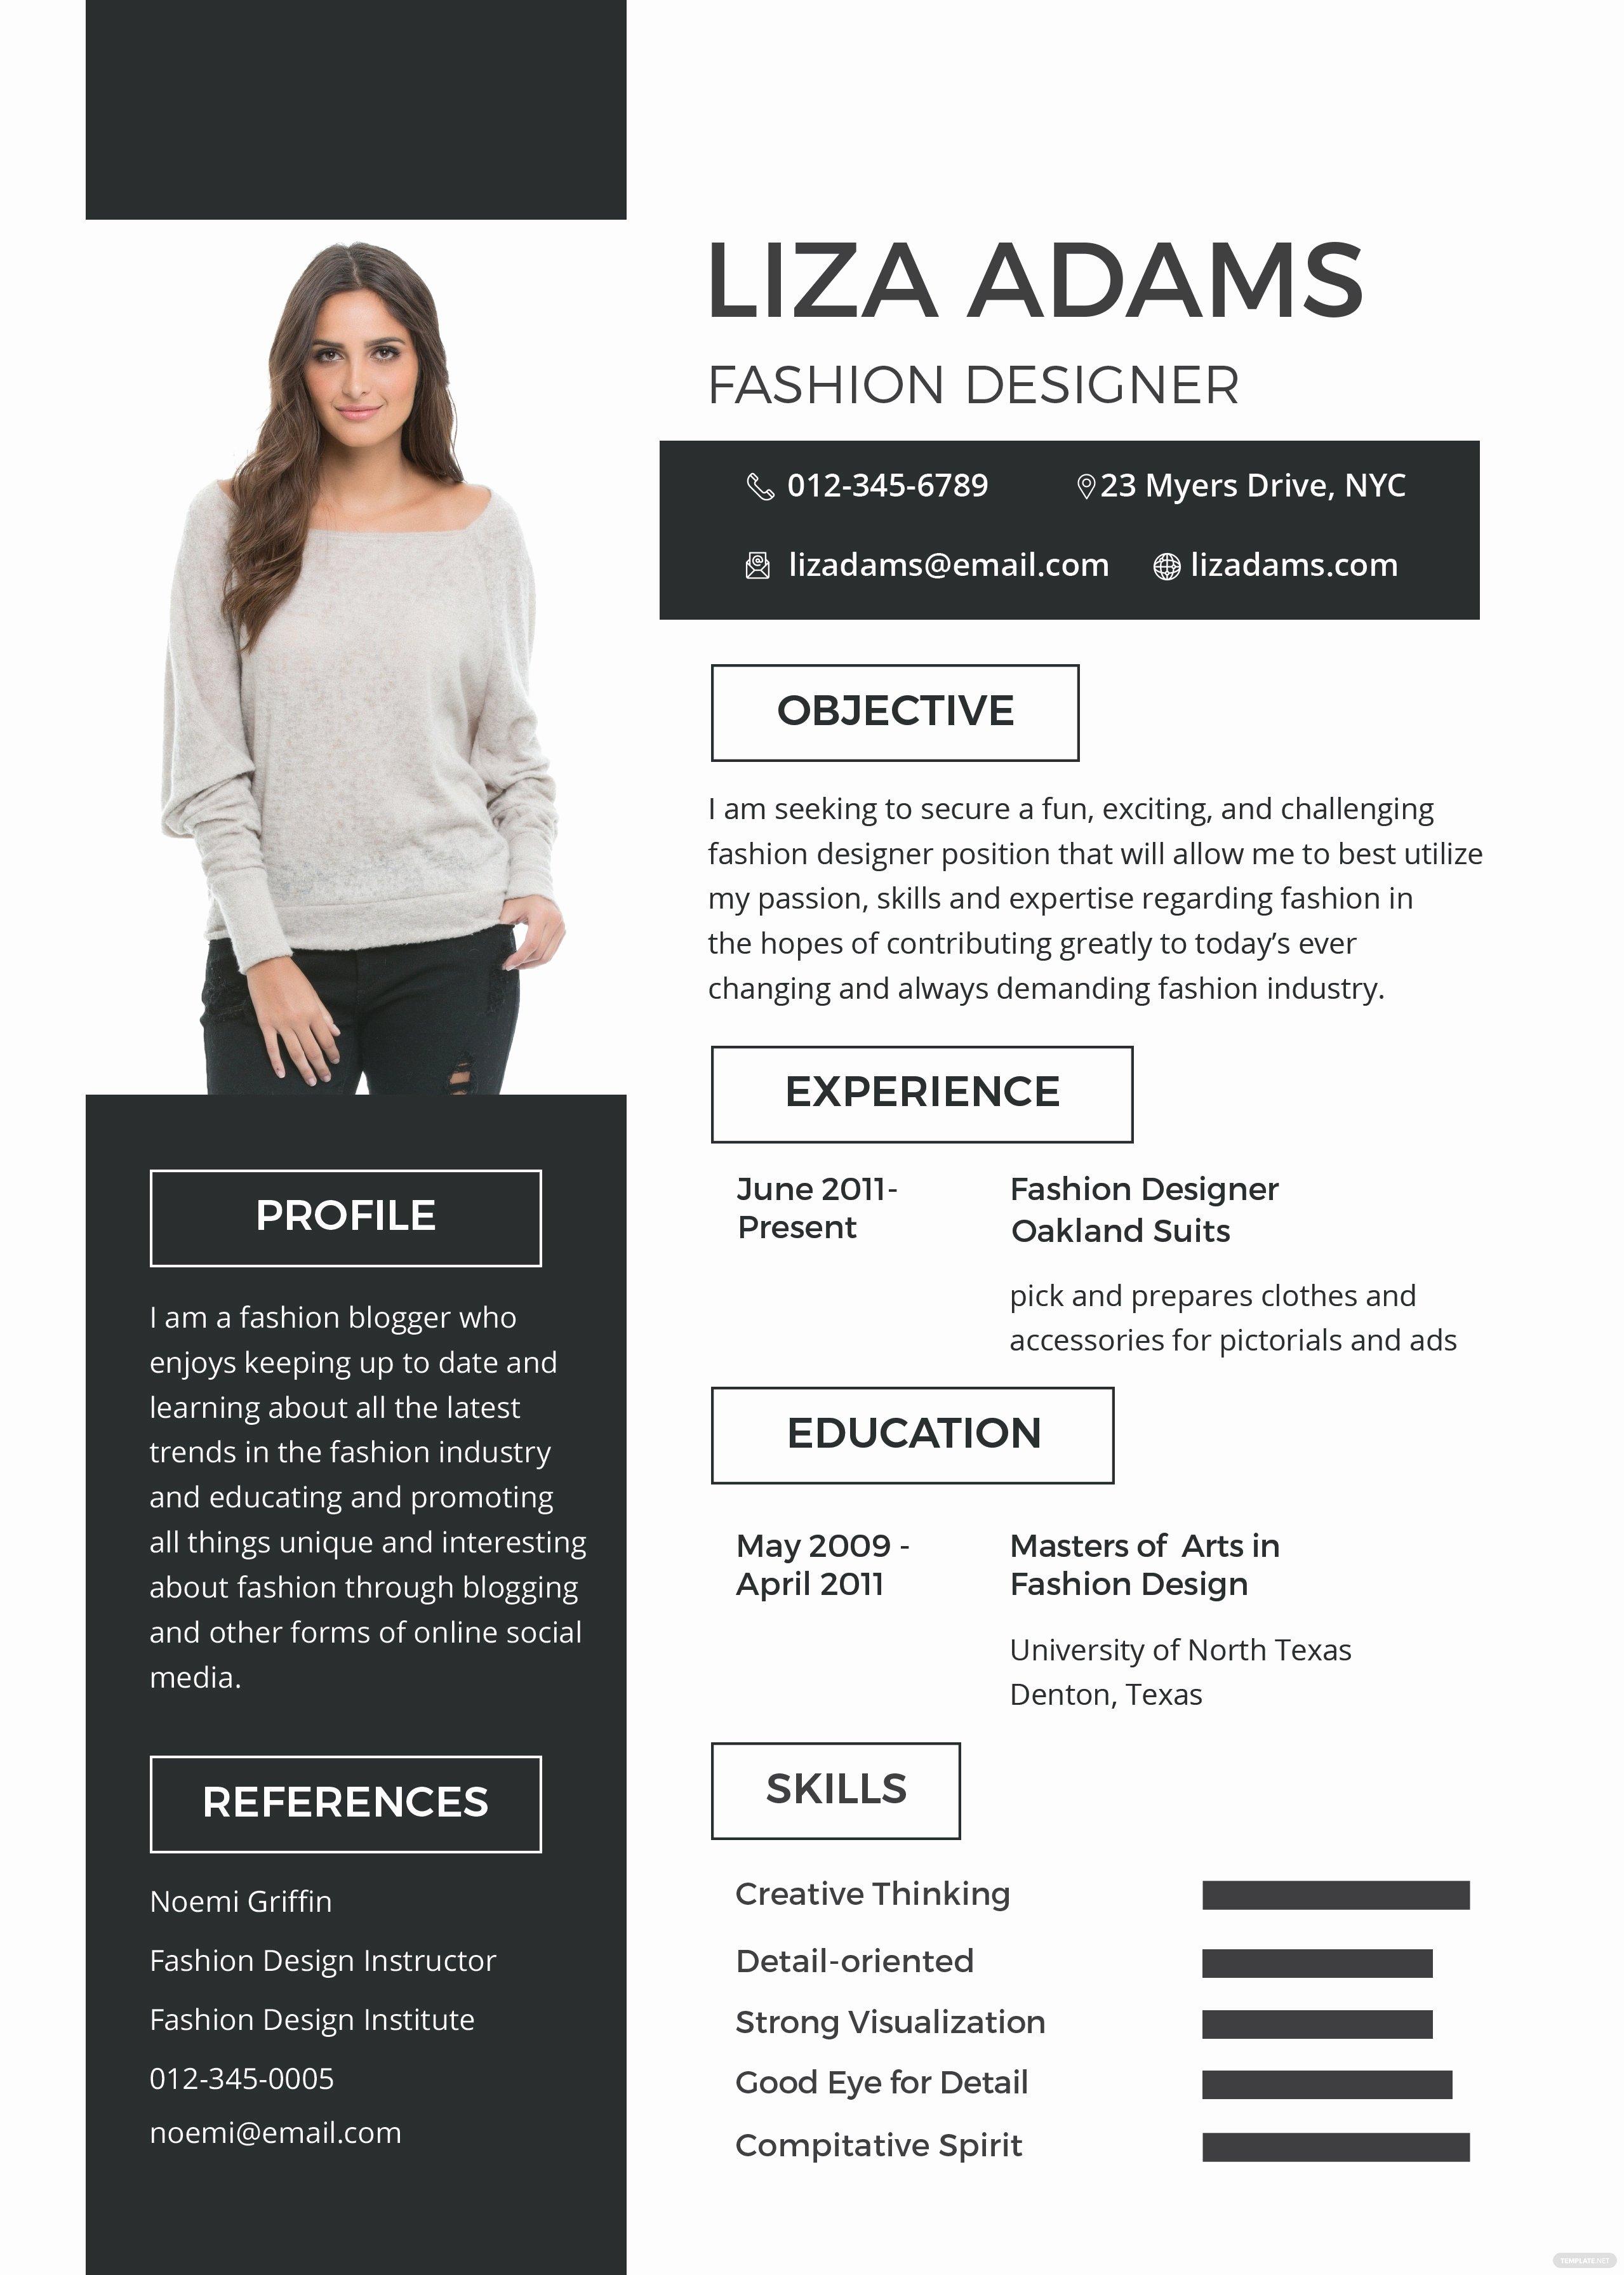 Makeup Artist Bio Sample Inspirational Free Fashion Designer Resume and Cv Template In Psd Ms